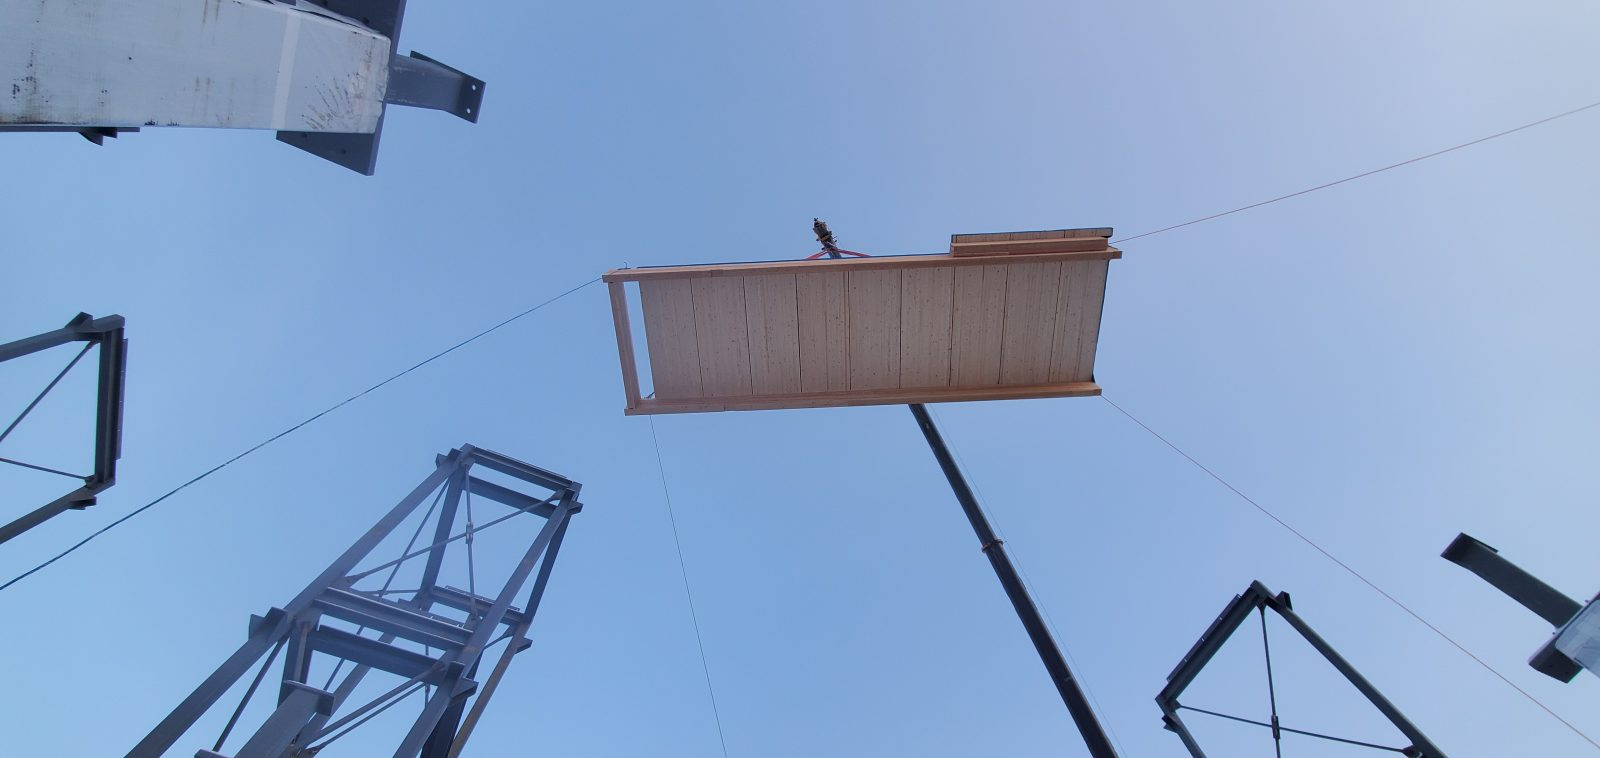 Mass timber hoisted